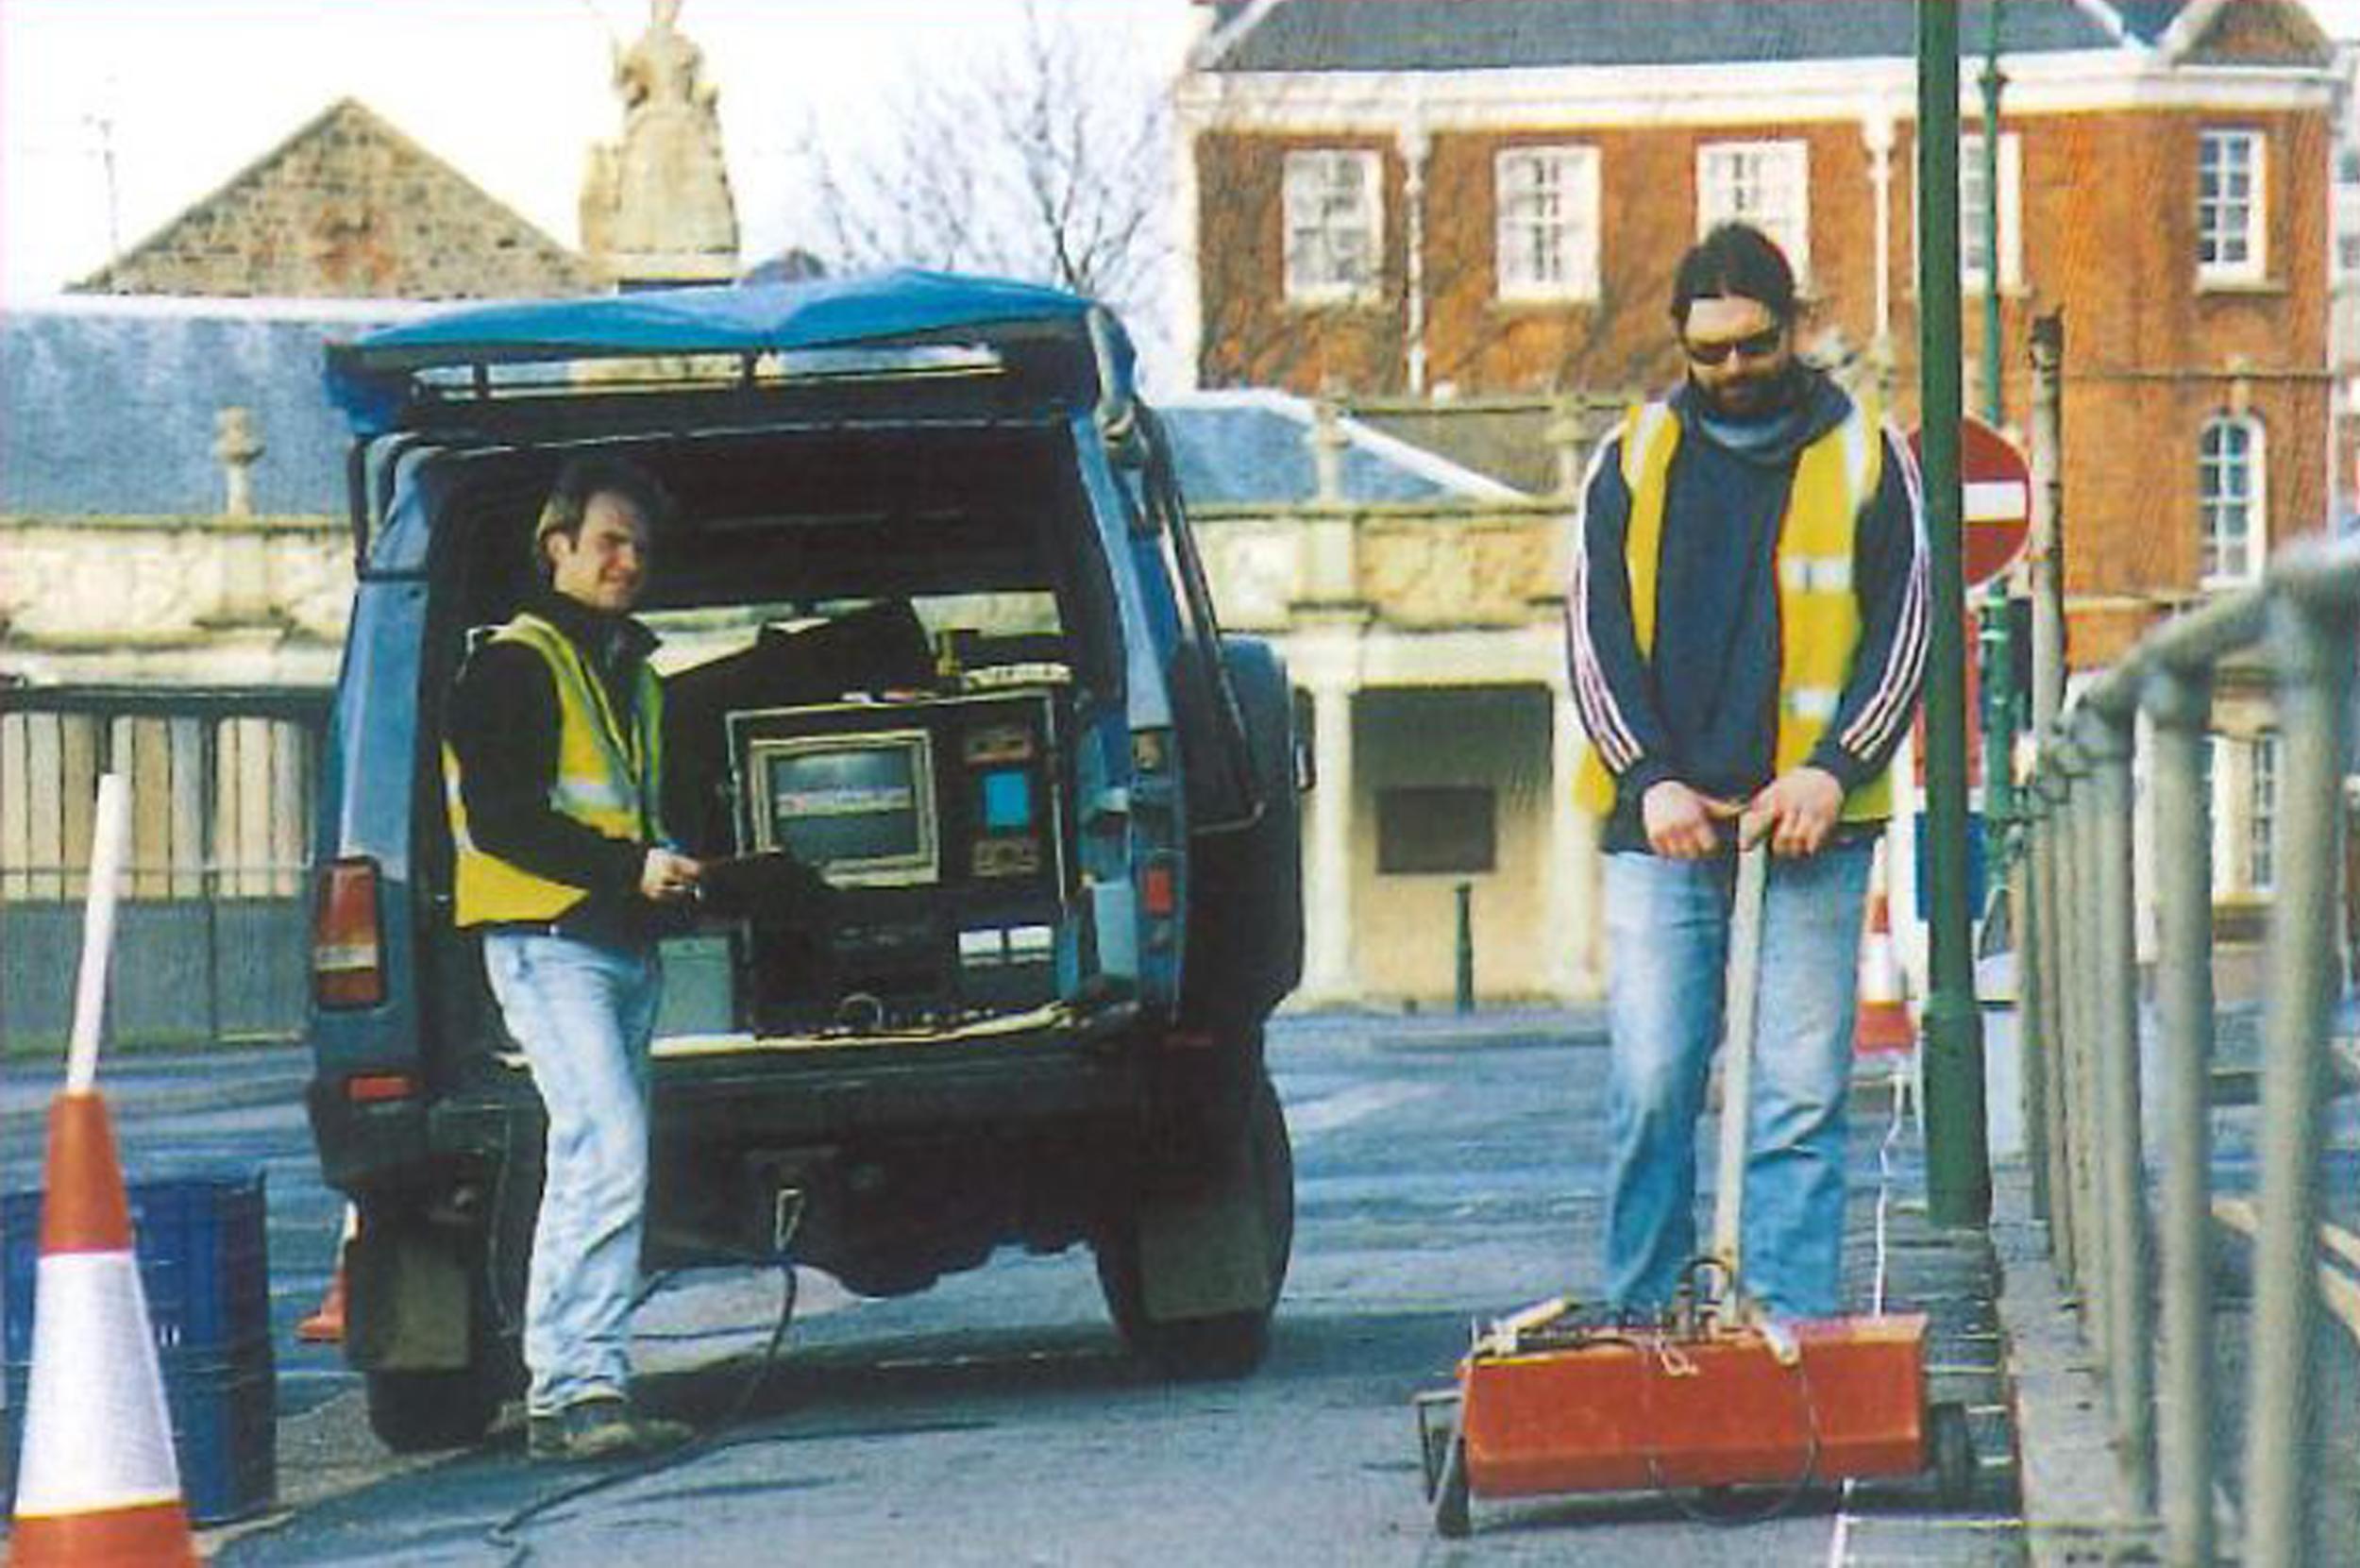 SIR 3 radar equipment being used on site